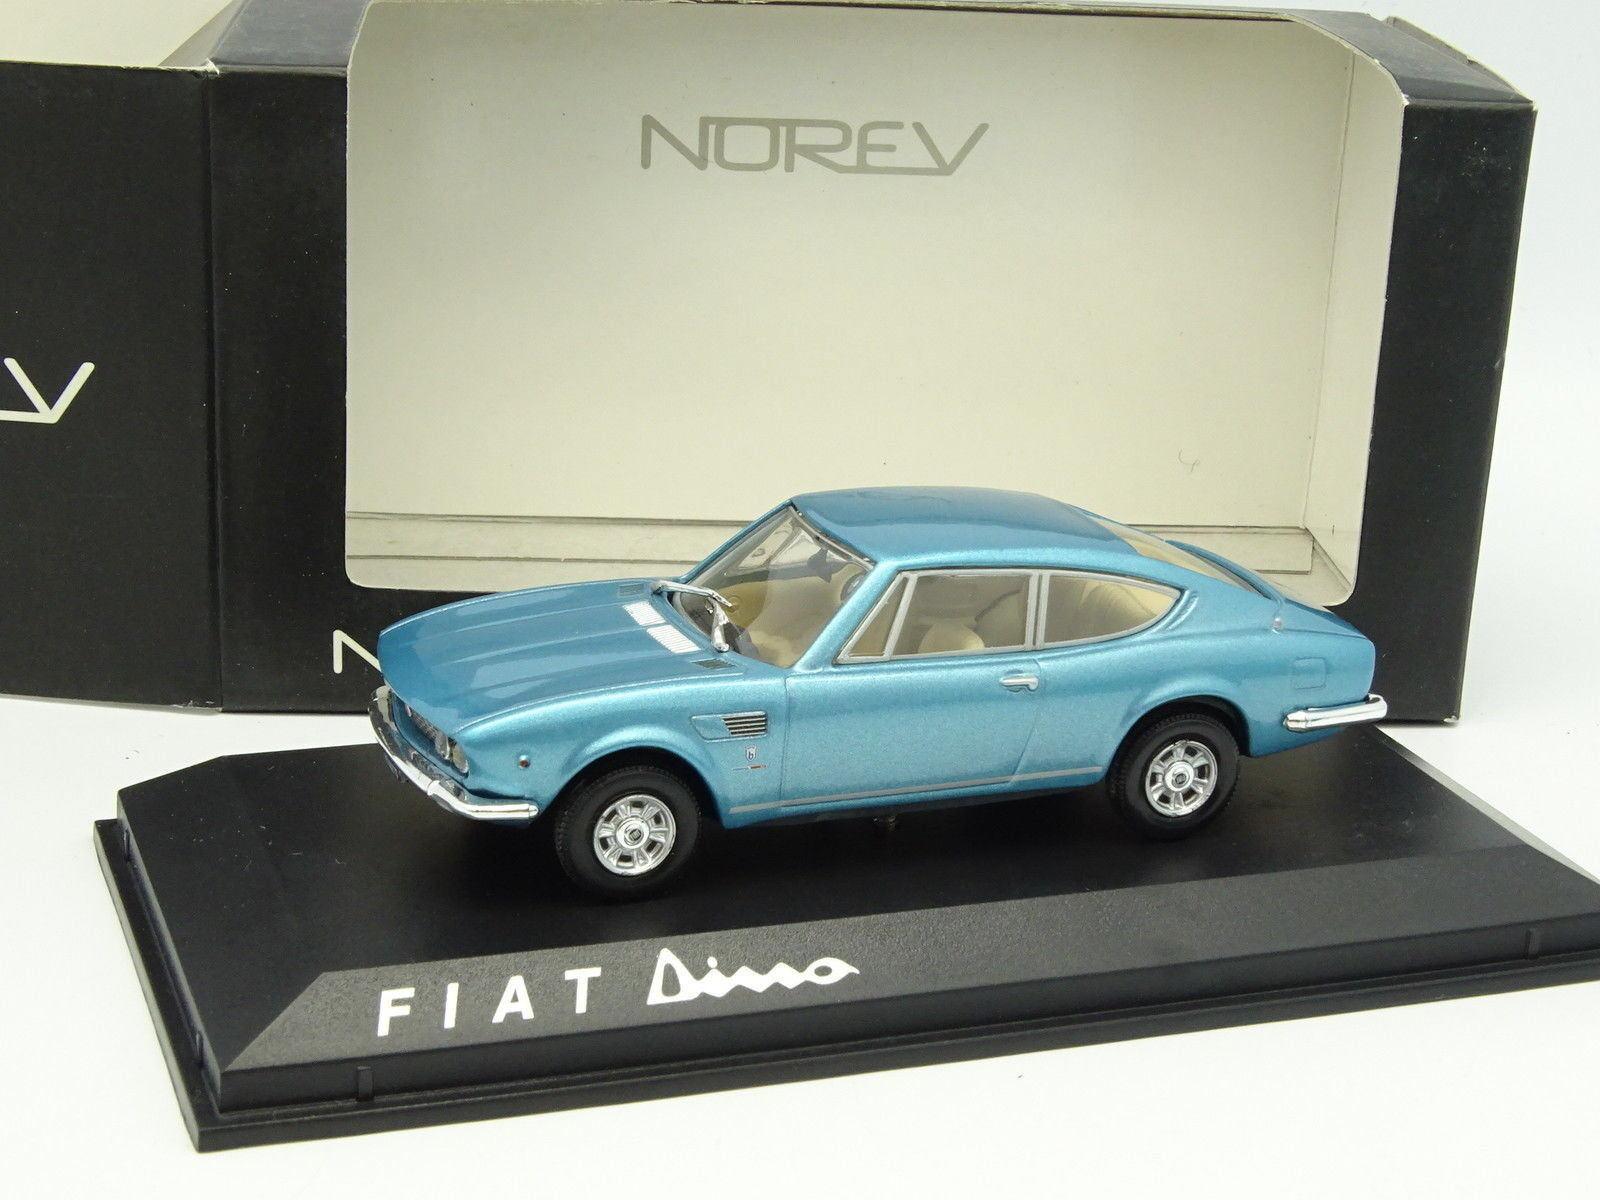 Norev 1 43 - Fiat Dino Blau